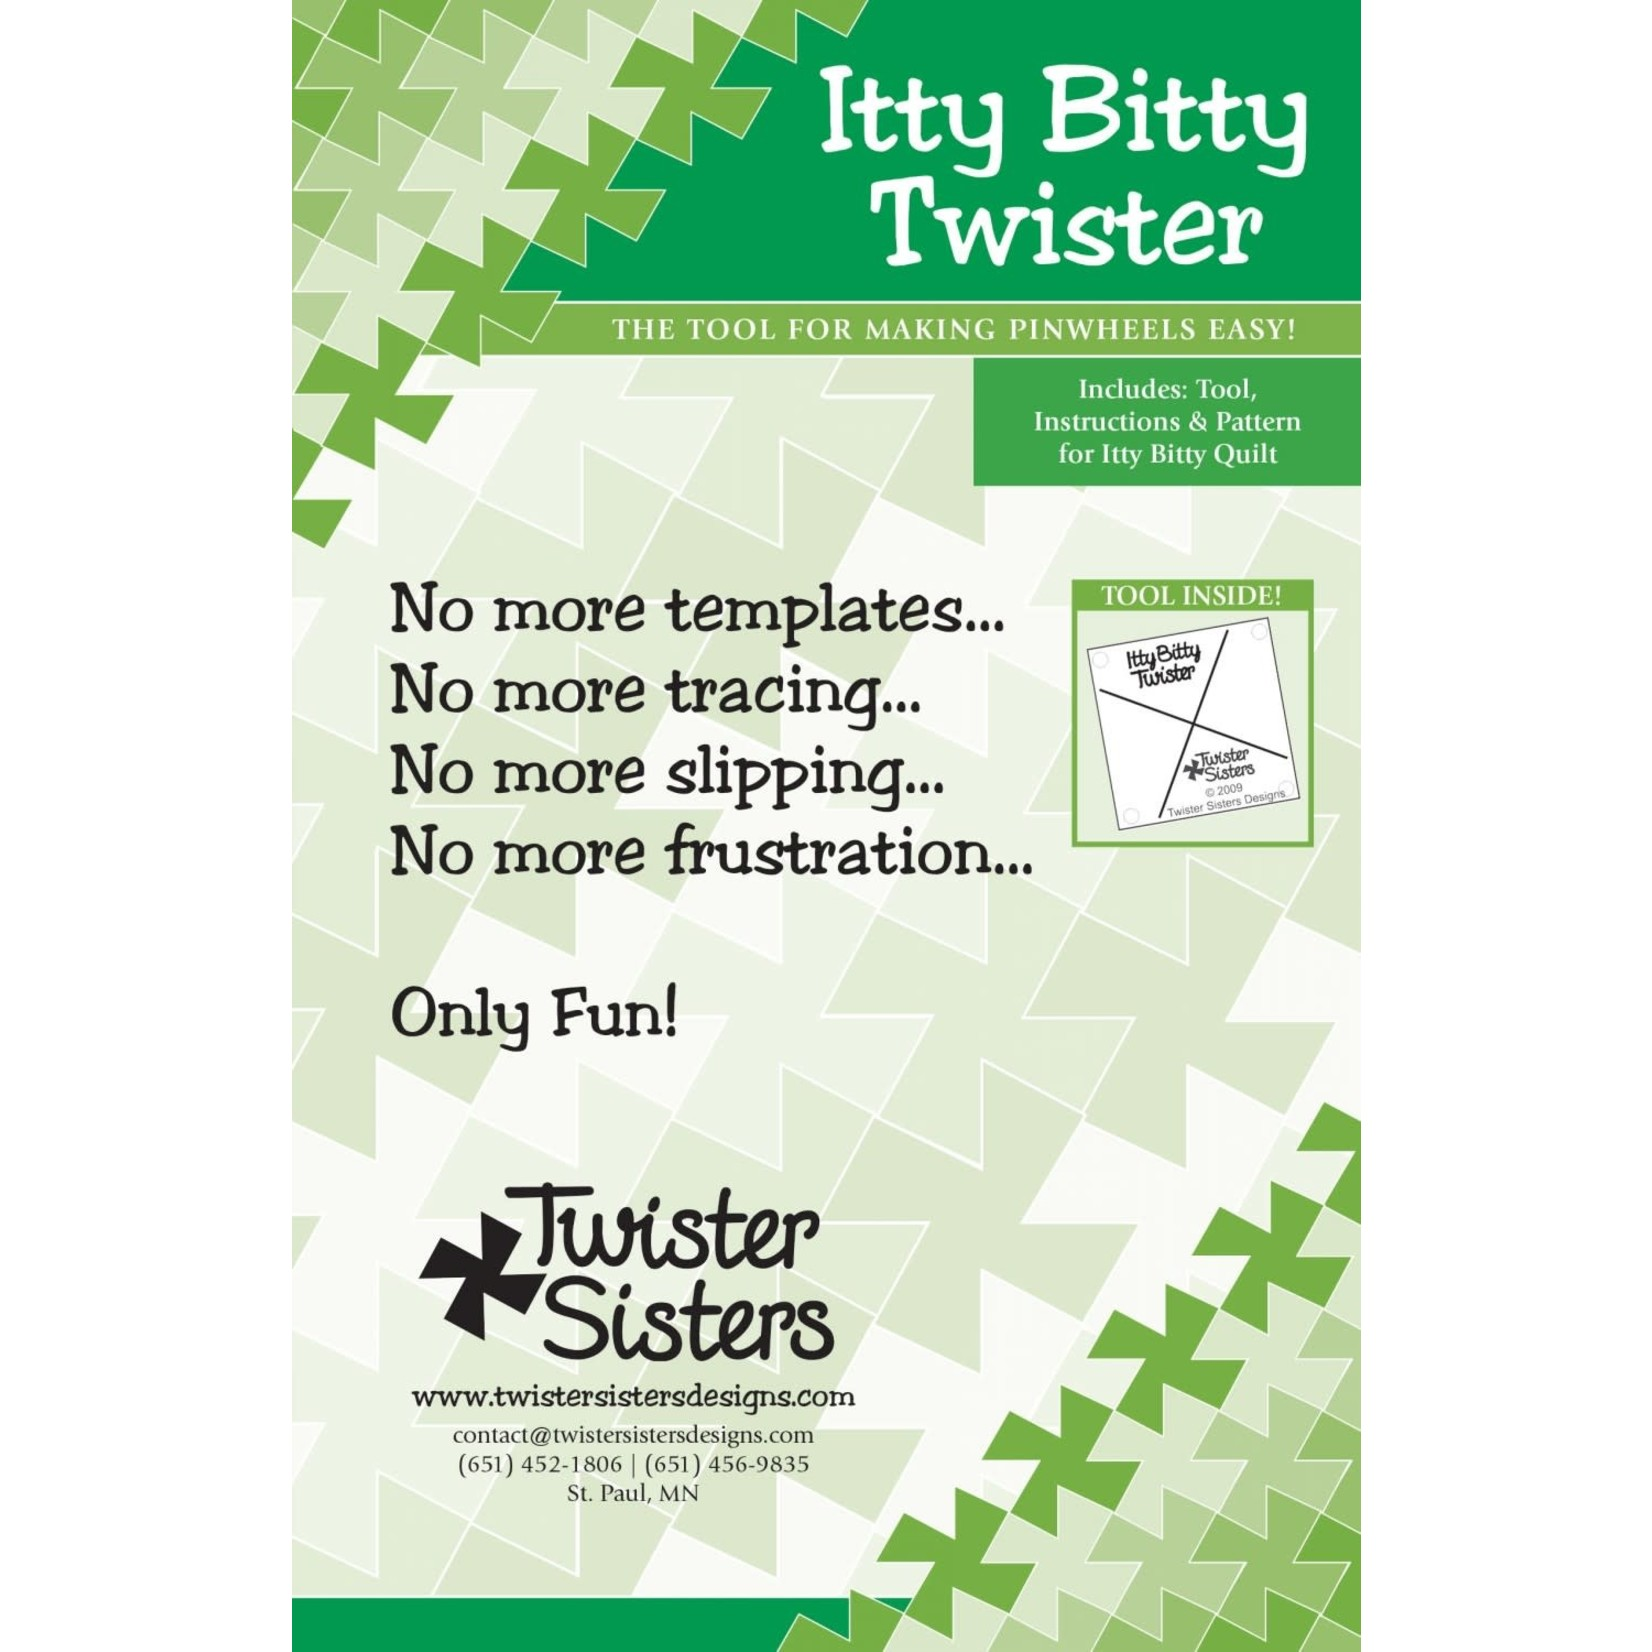 Twister Sisters Itty Bitty Twister Pinwheel